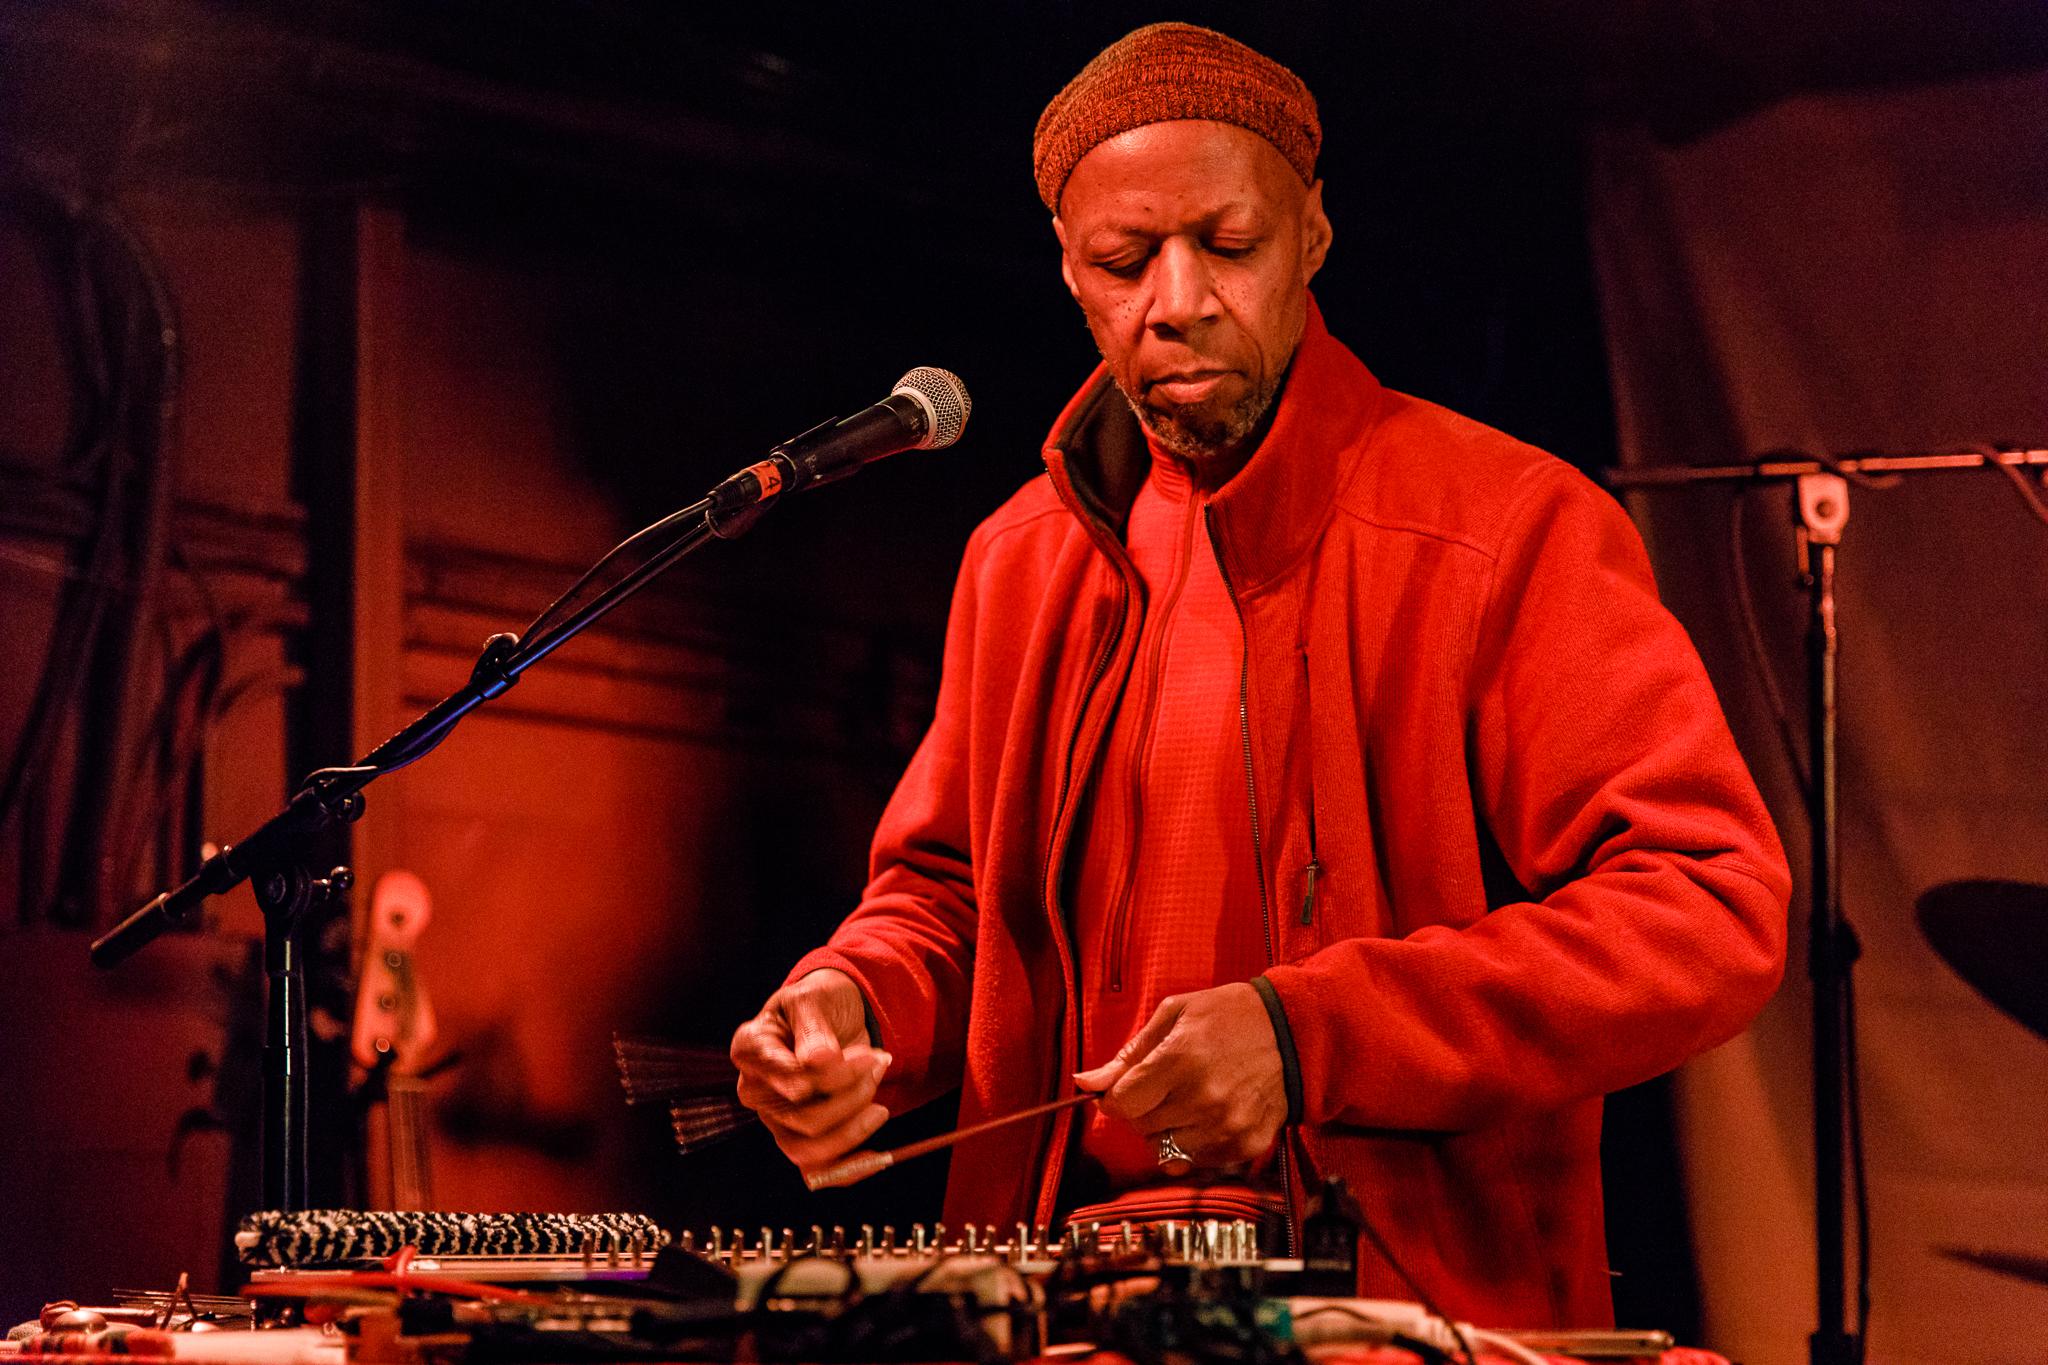 Laraaji performing at the Rock and Roll Hotel in Washington, DC - 3/8/2018 (photo by Matt Condon / @arcane93)